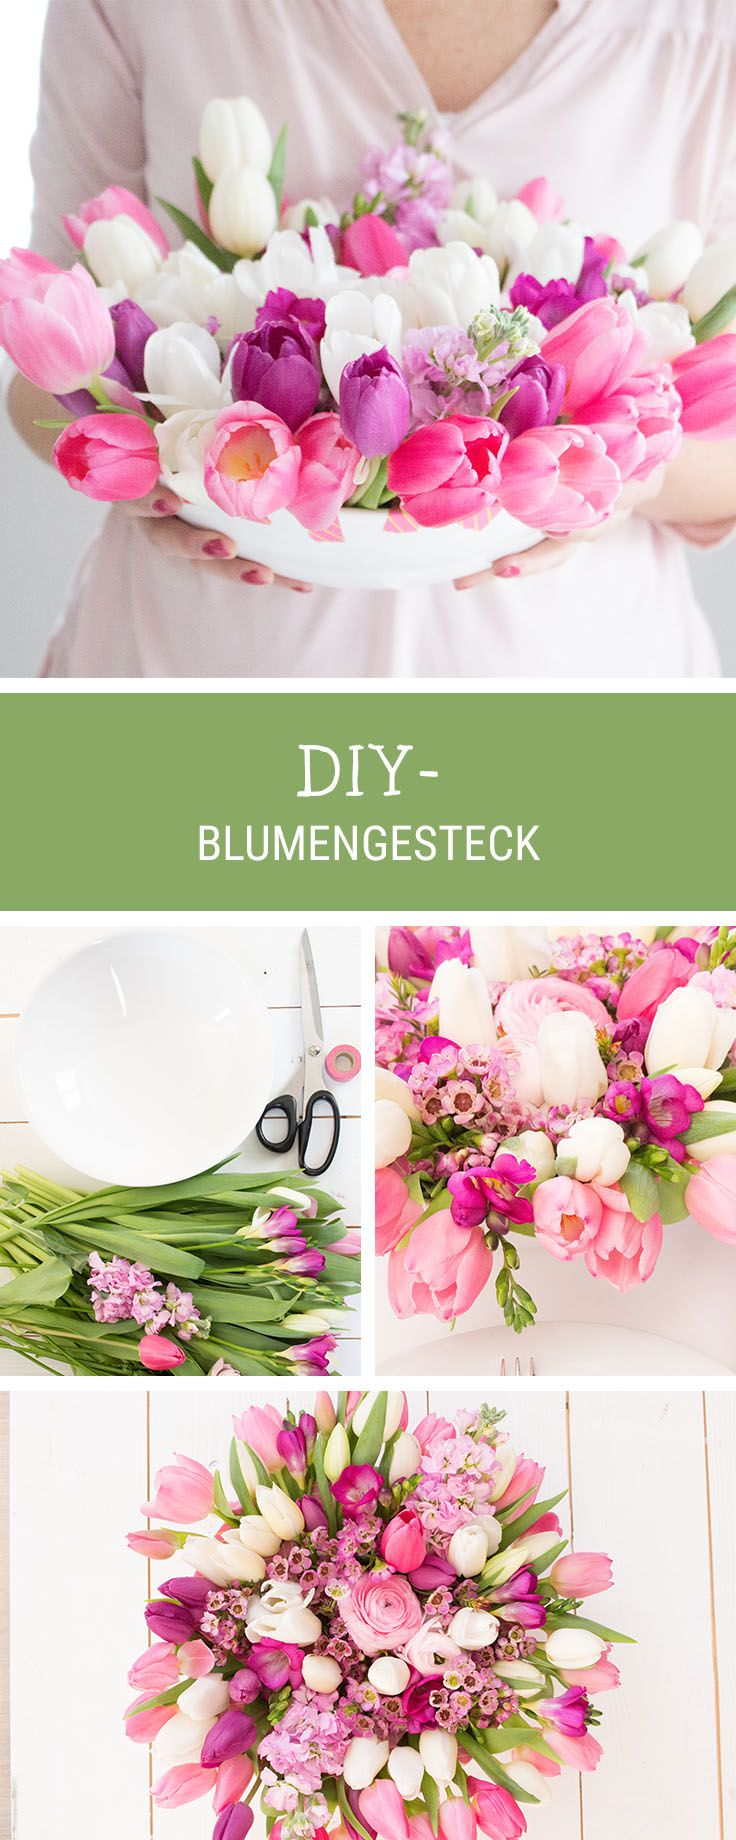 25+ Best Ideas About Blumengestecke Selber Machen On Pinterest ... Pflanztisch Fur Den Garten Ideen Selbermachen